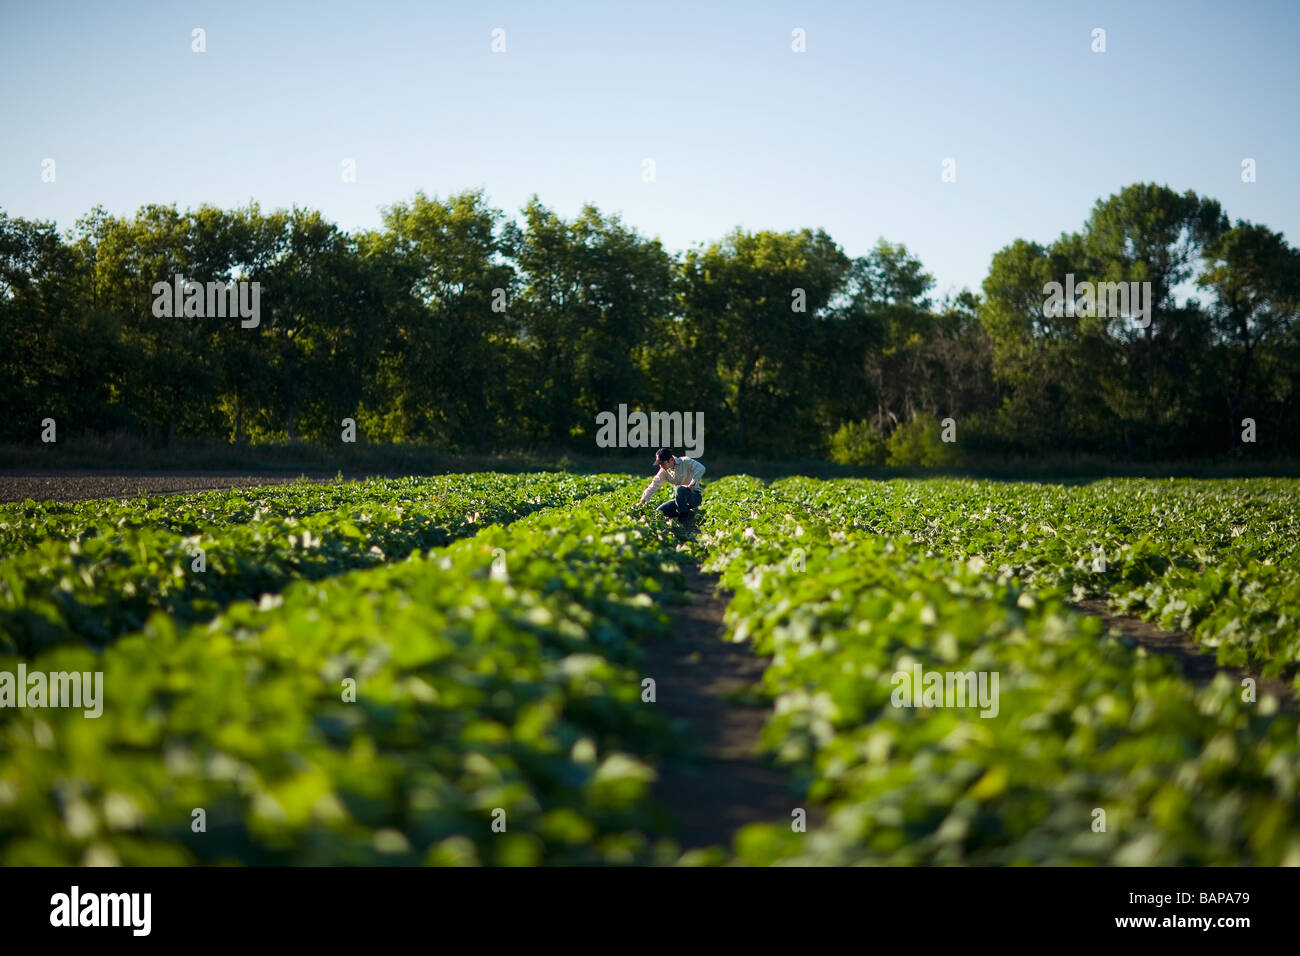 Farmer kneels in rows of cucumbers, Lumsden, Saskatchewan, Canada Stock Photo